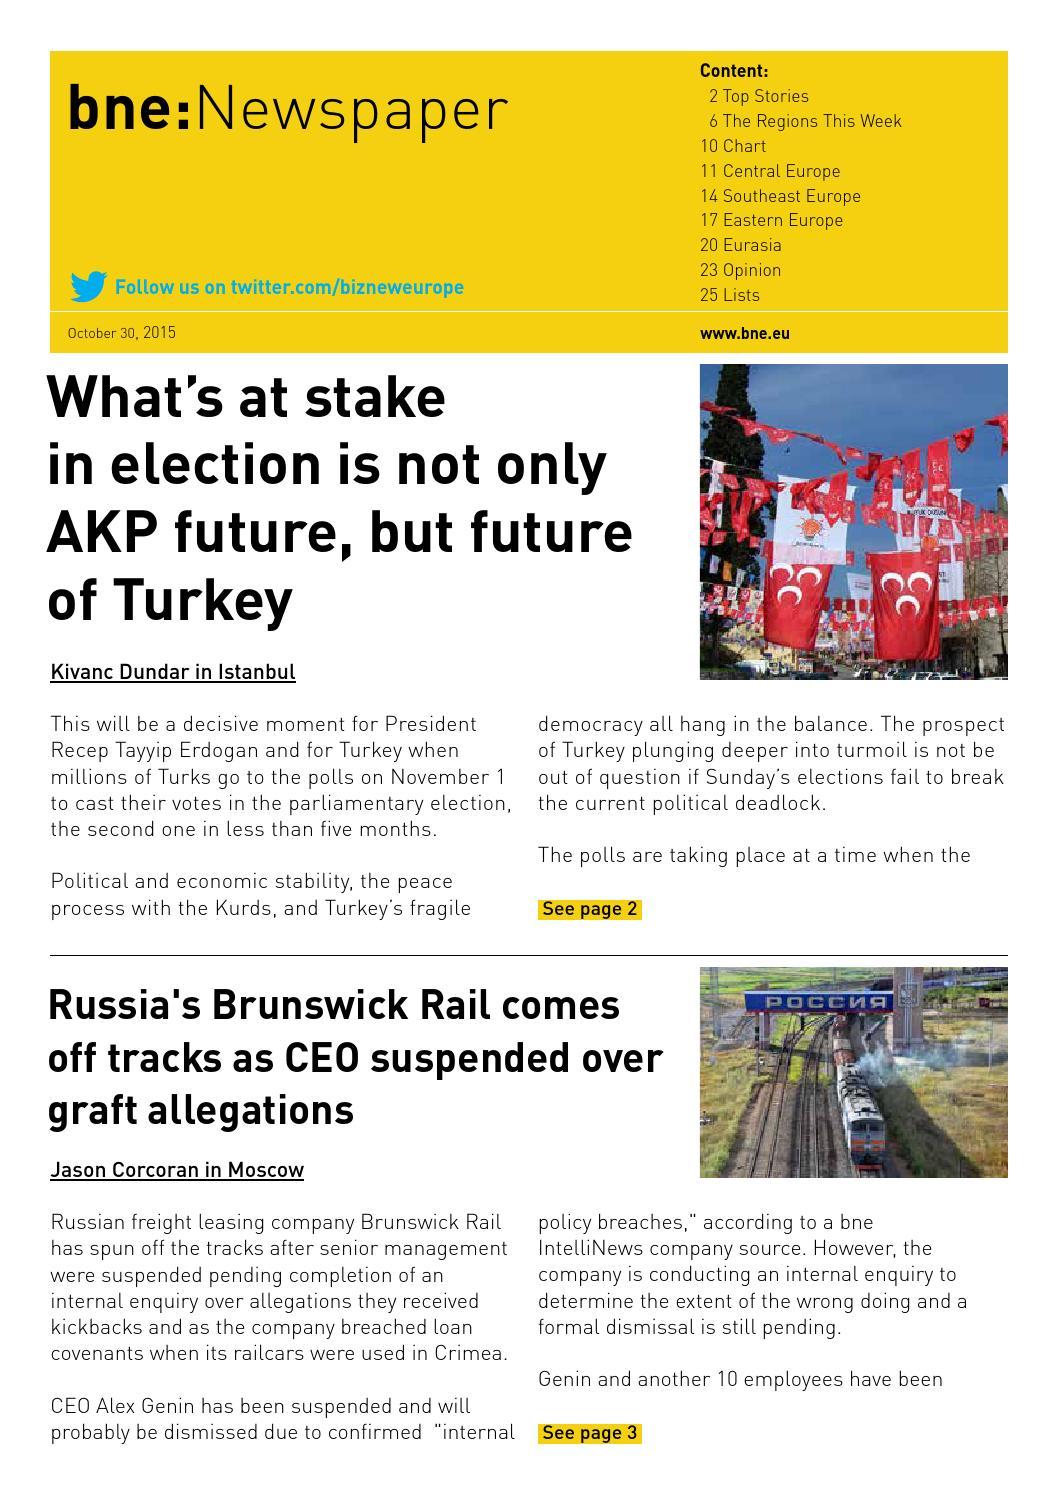 bne:Newspaper October 30, 2015 by Ben Aris issuu